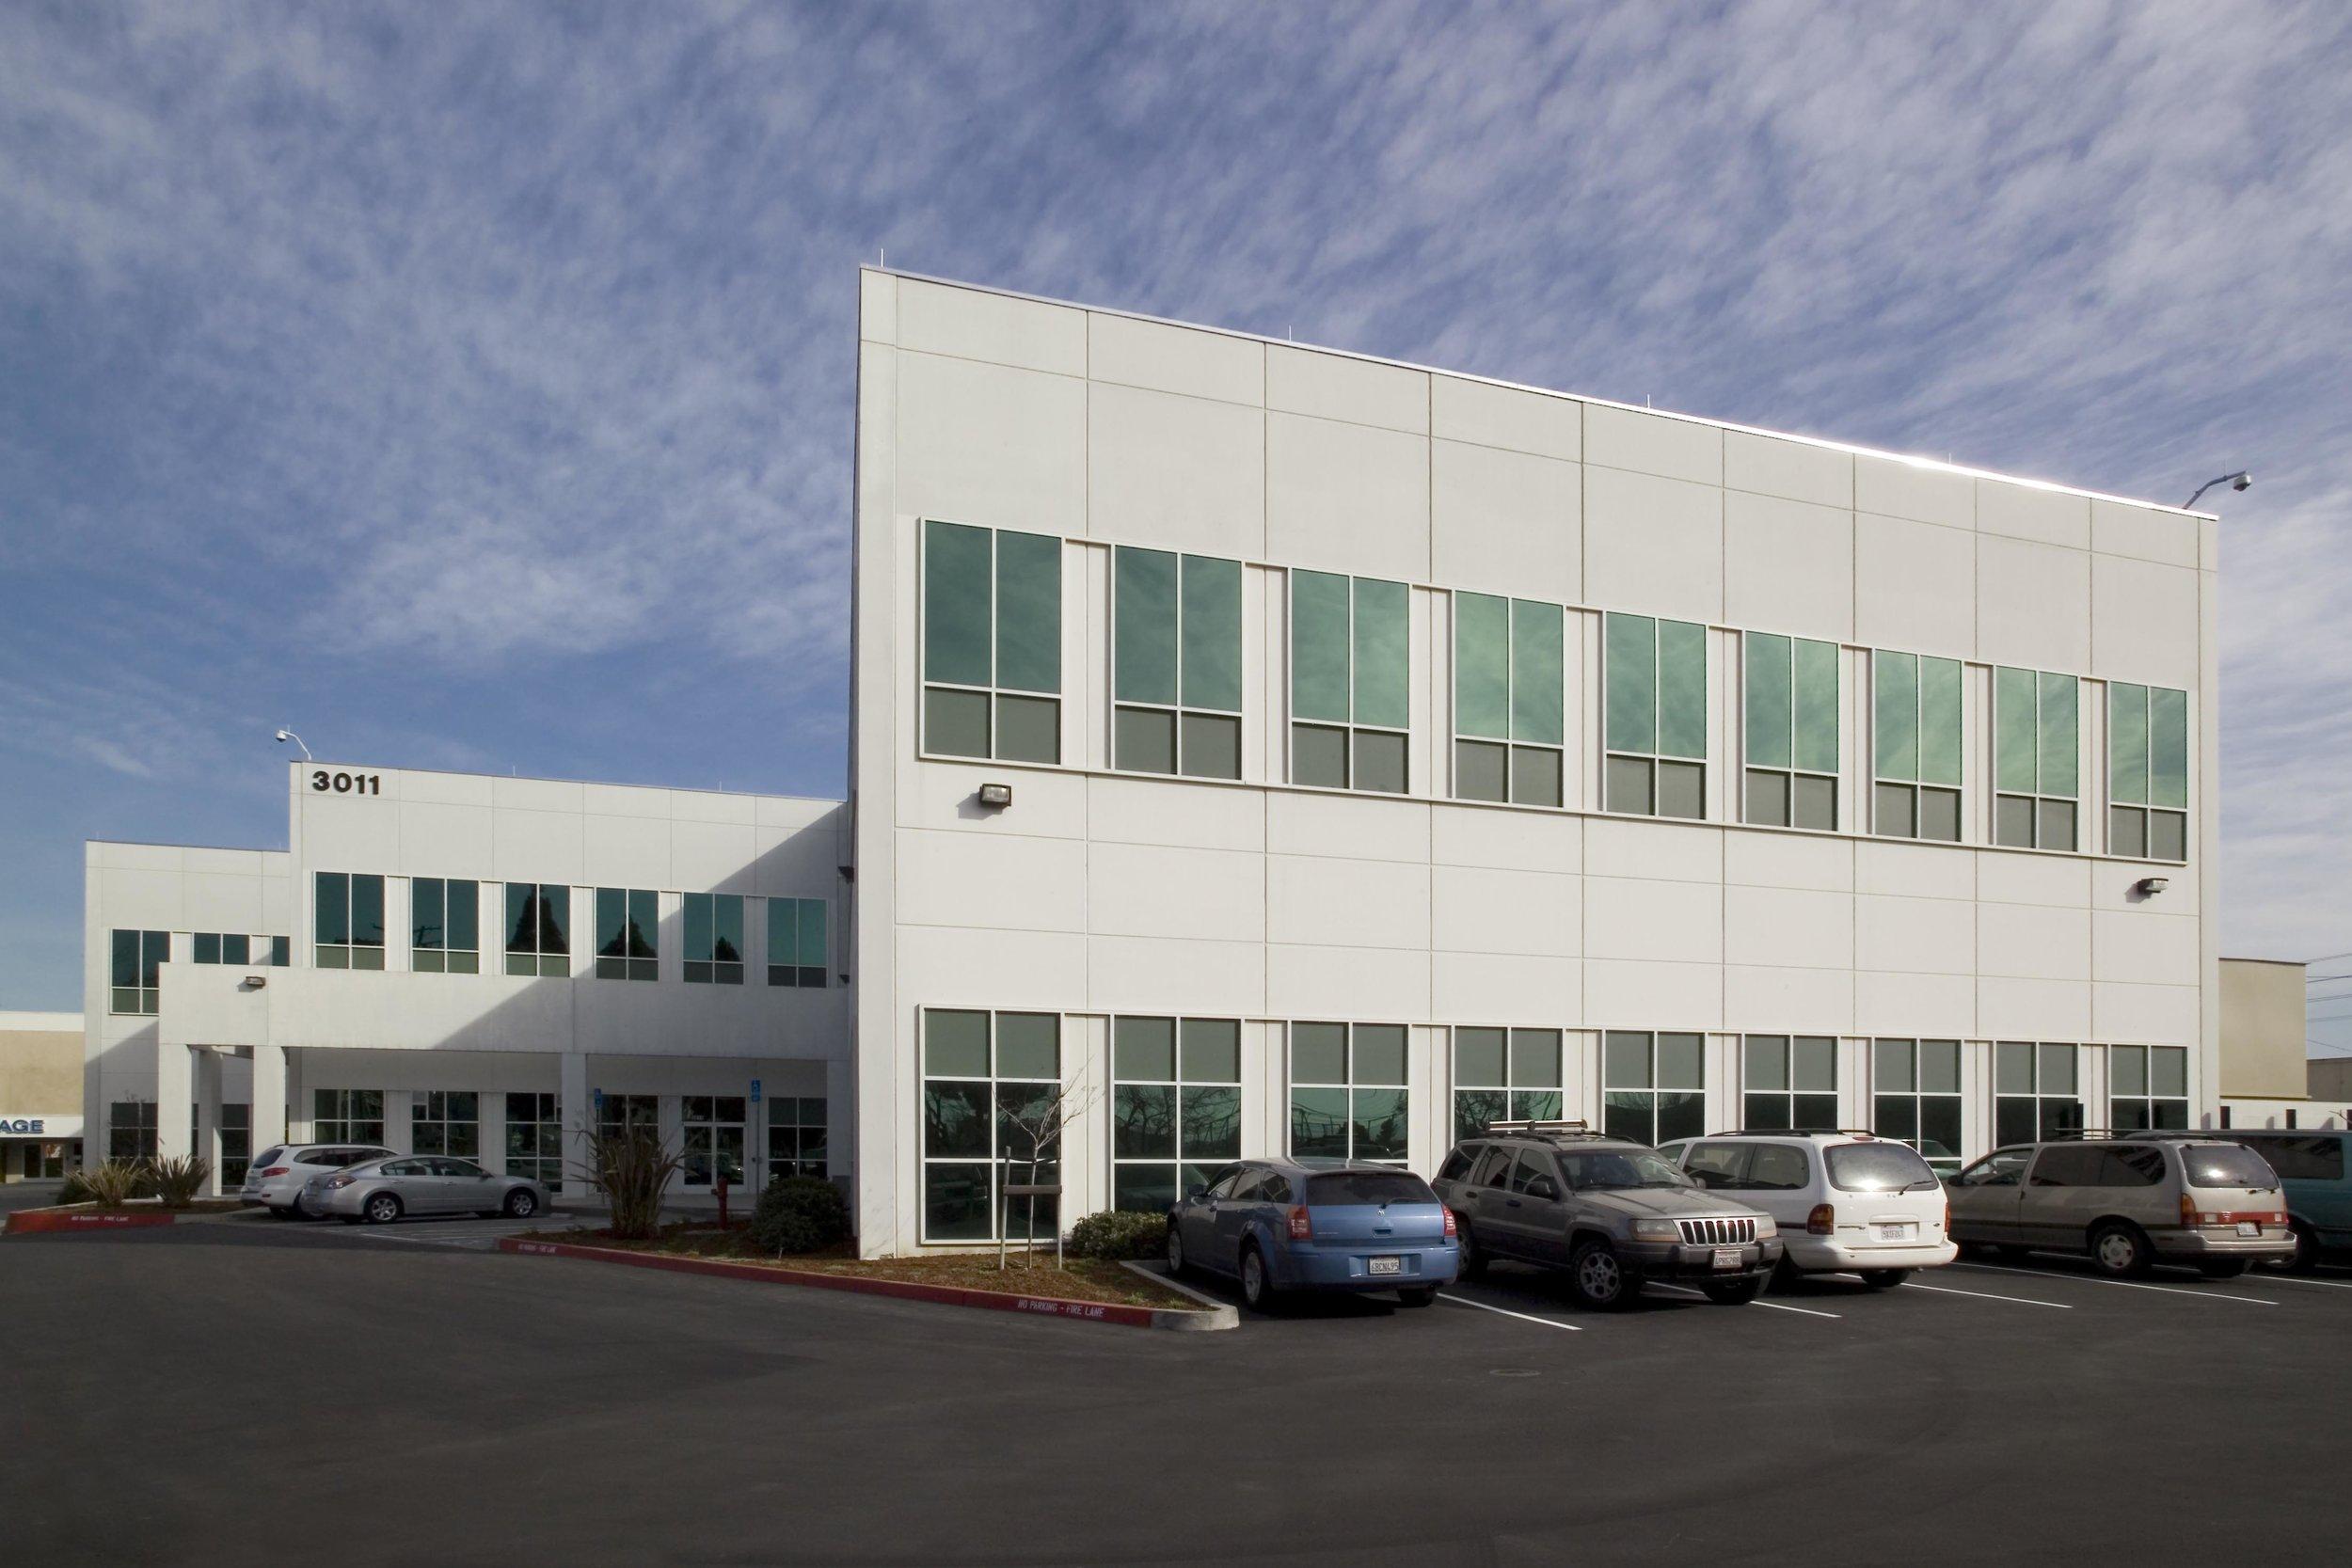 3011 Lafayette Data Center